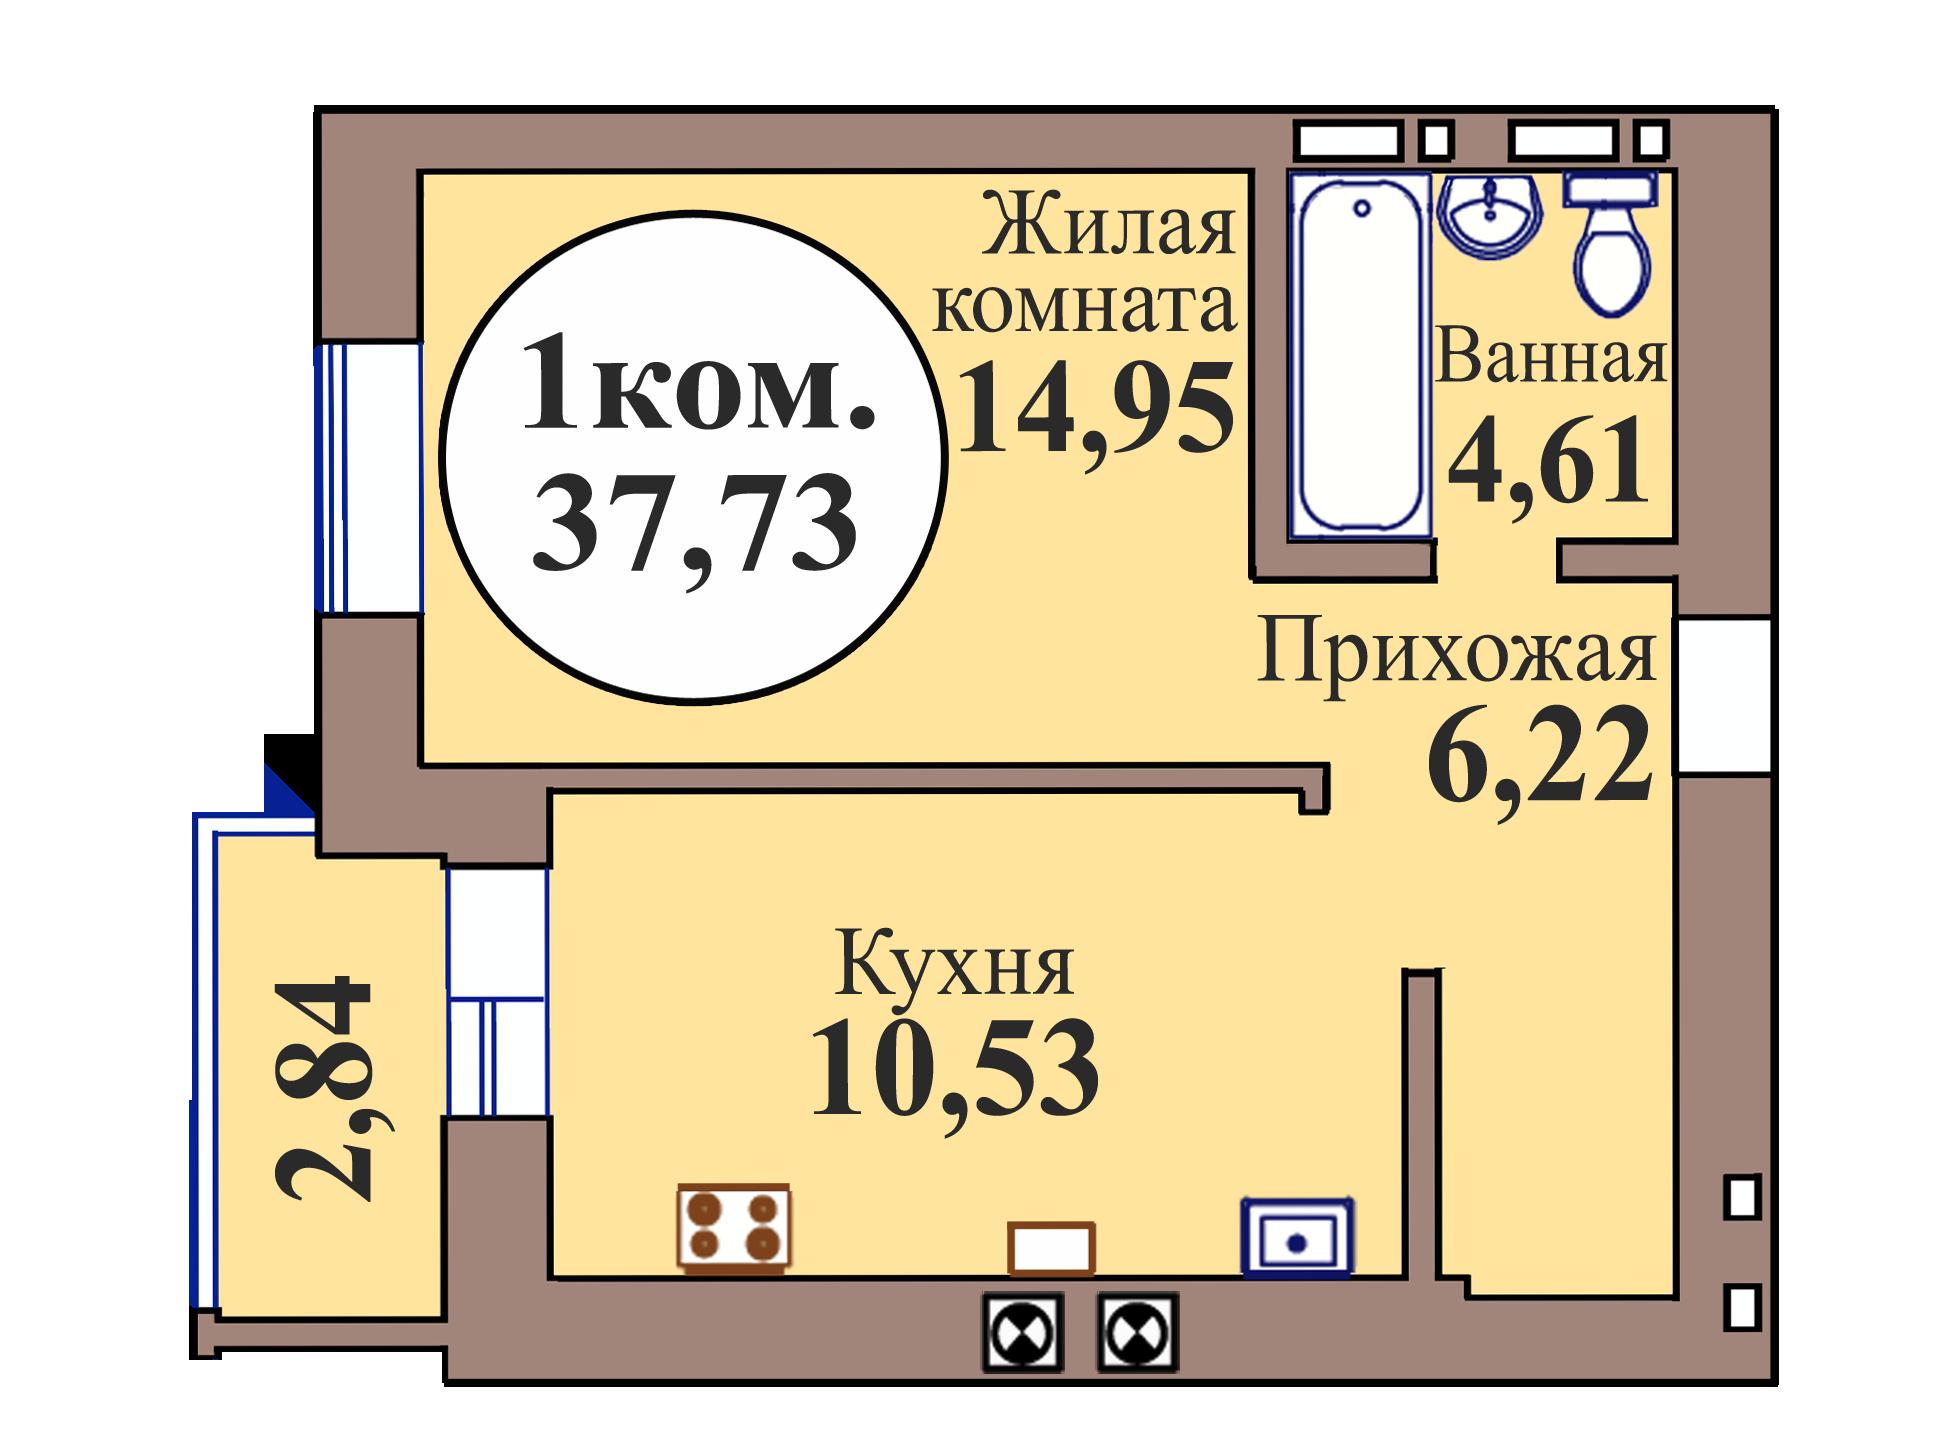 1-комн. кв. по пер. Калининградский, 5 кв. 238 в Калининграде